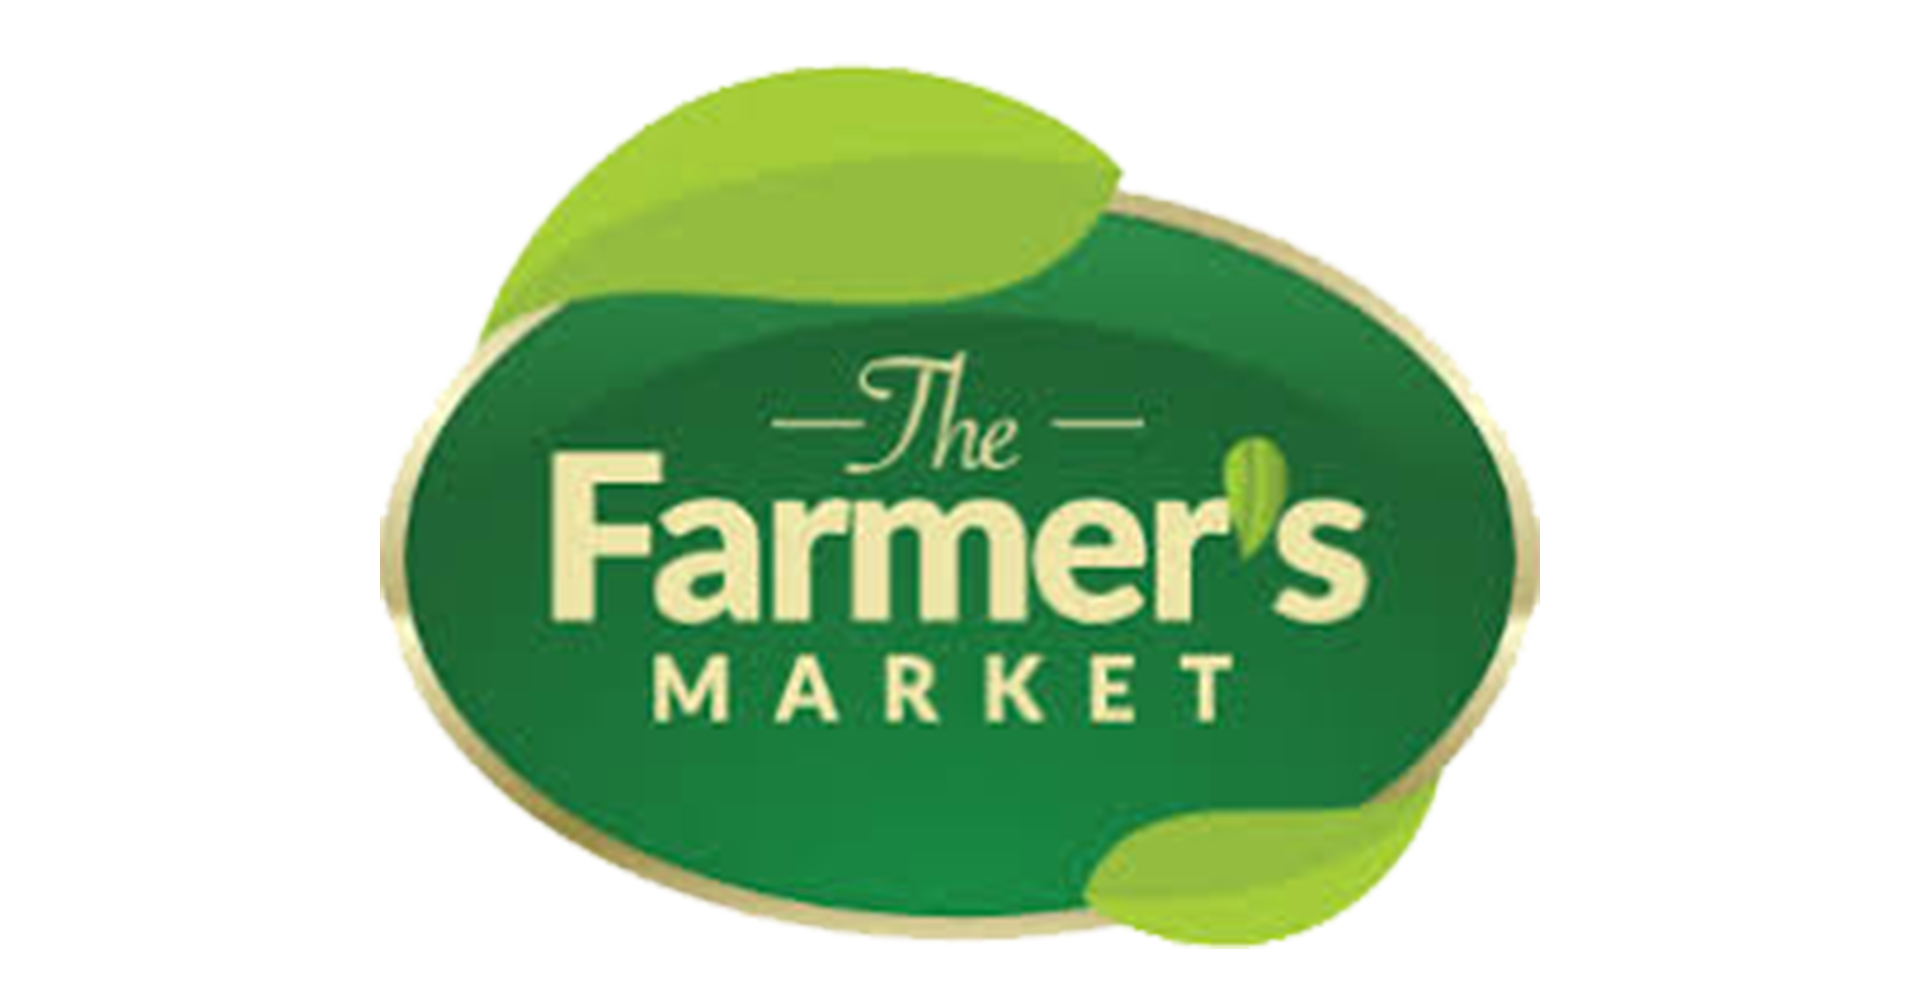 Partners The Farmers Market